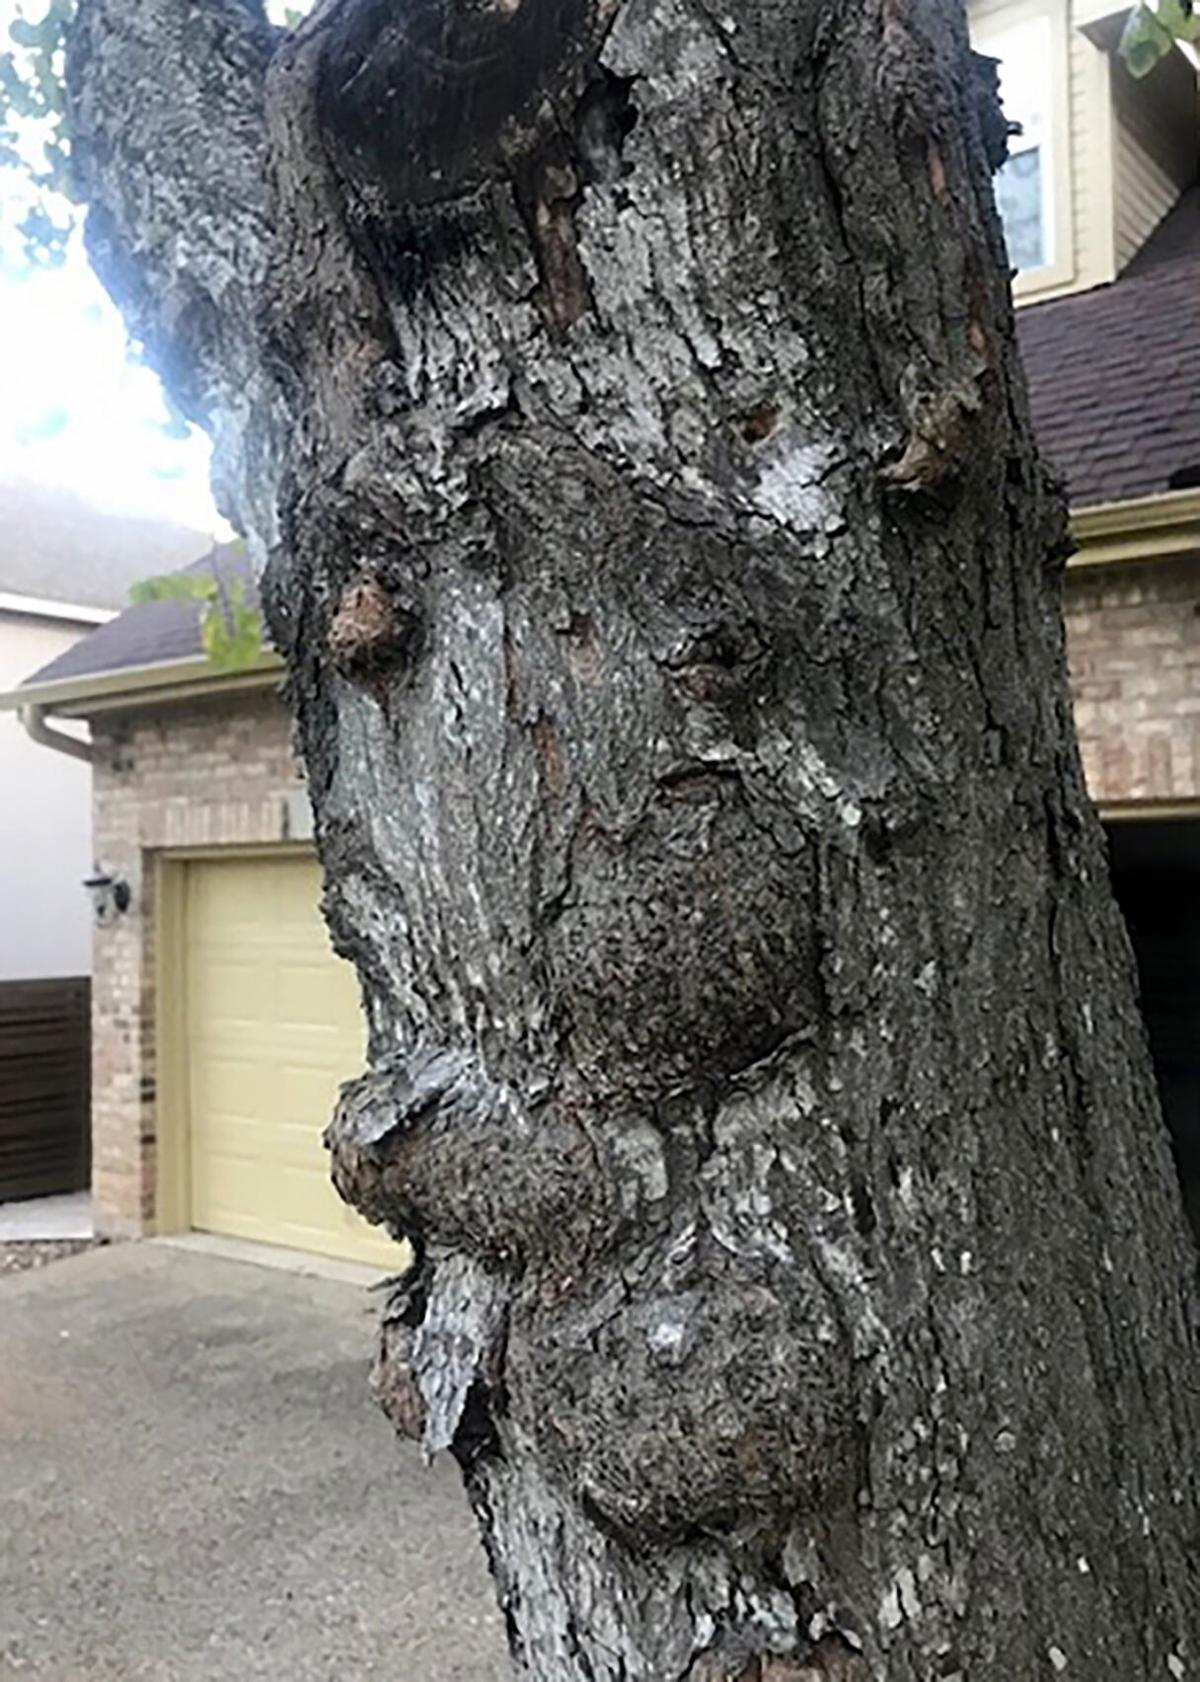 Burl on tree trunk